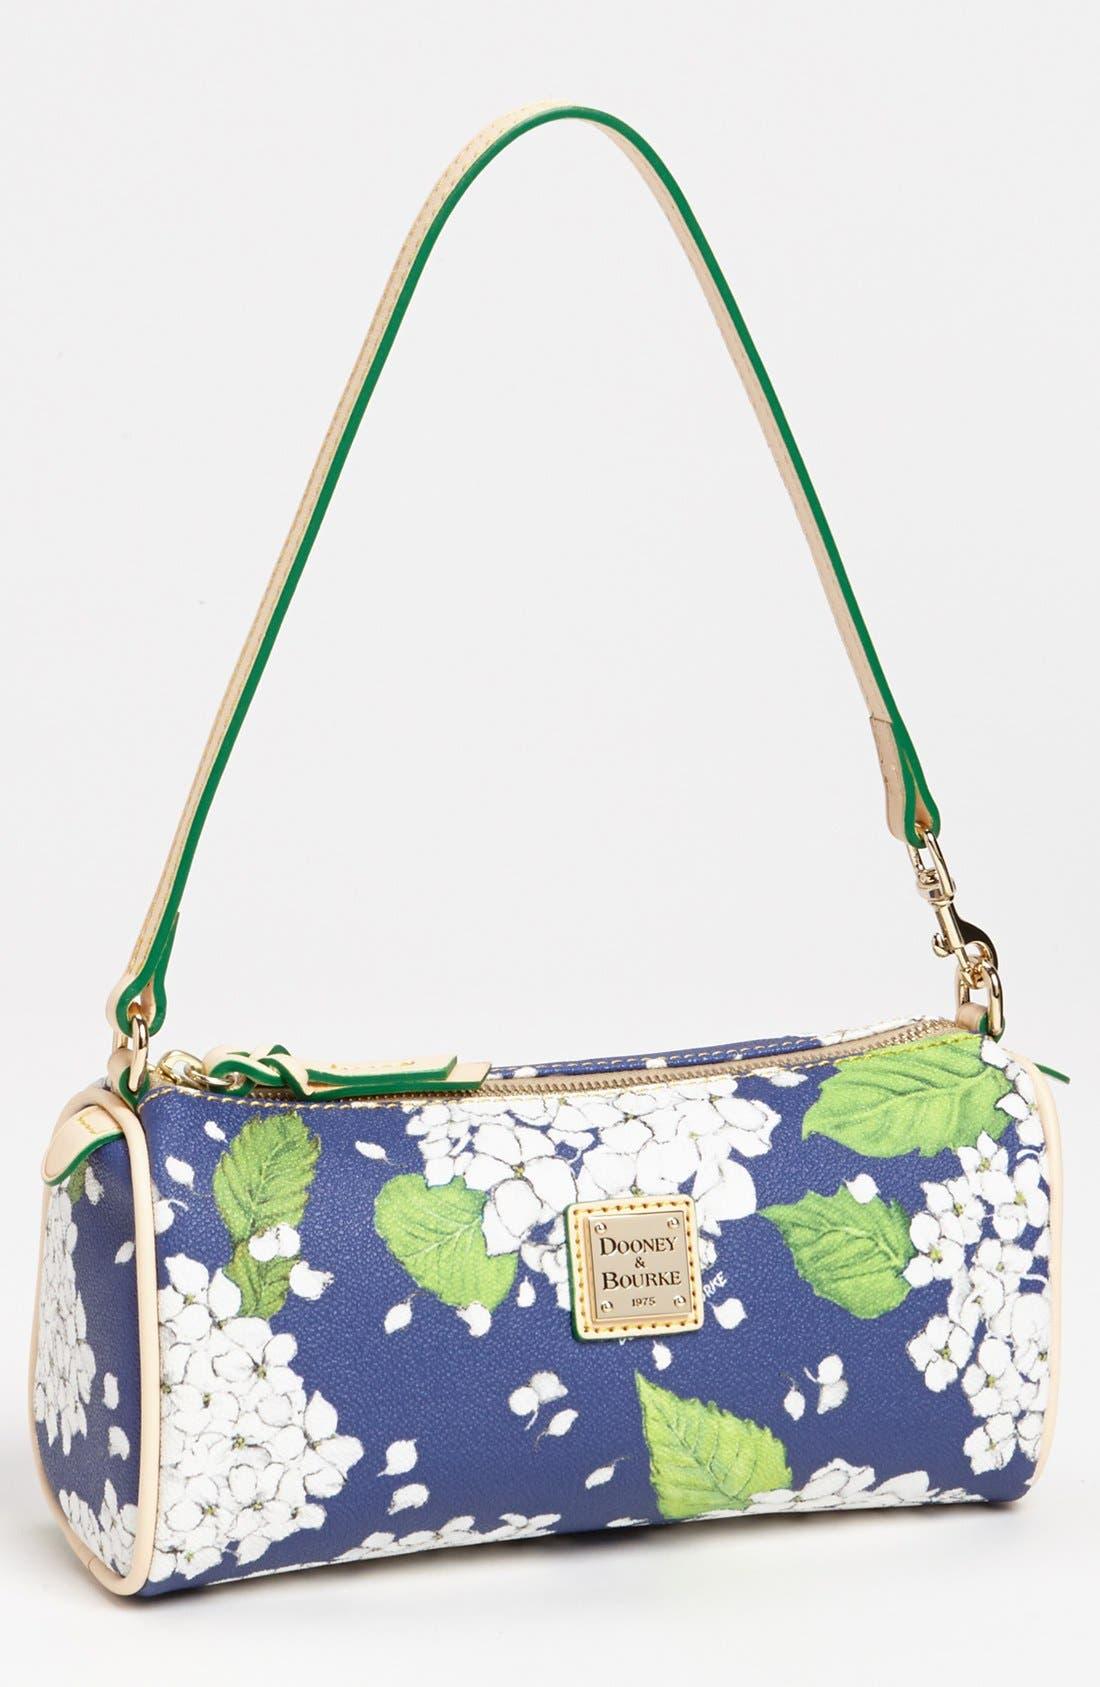 Alternate Image 1 Selected - Dooney & Bourke 'Hydrangea - Small' Barrel Shoulder Bag